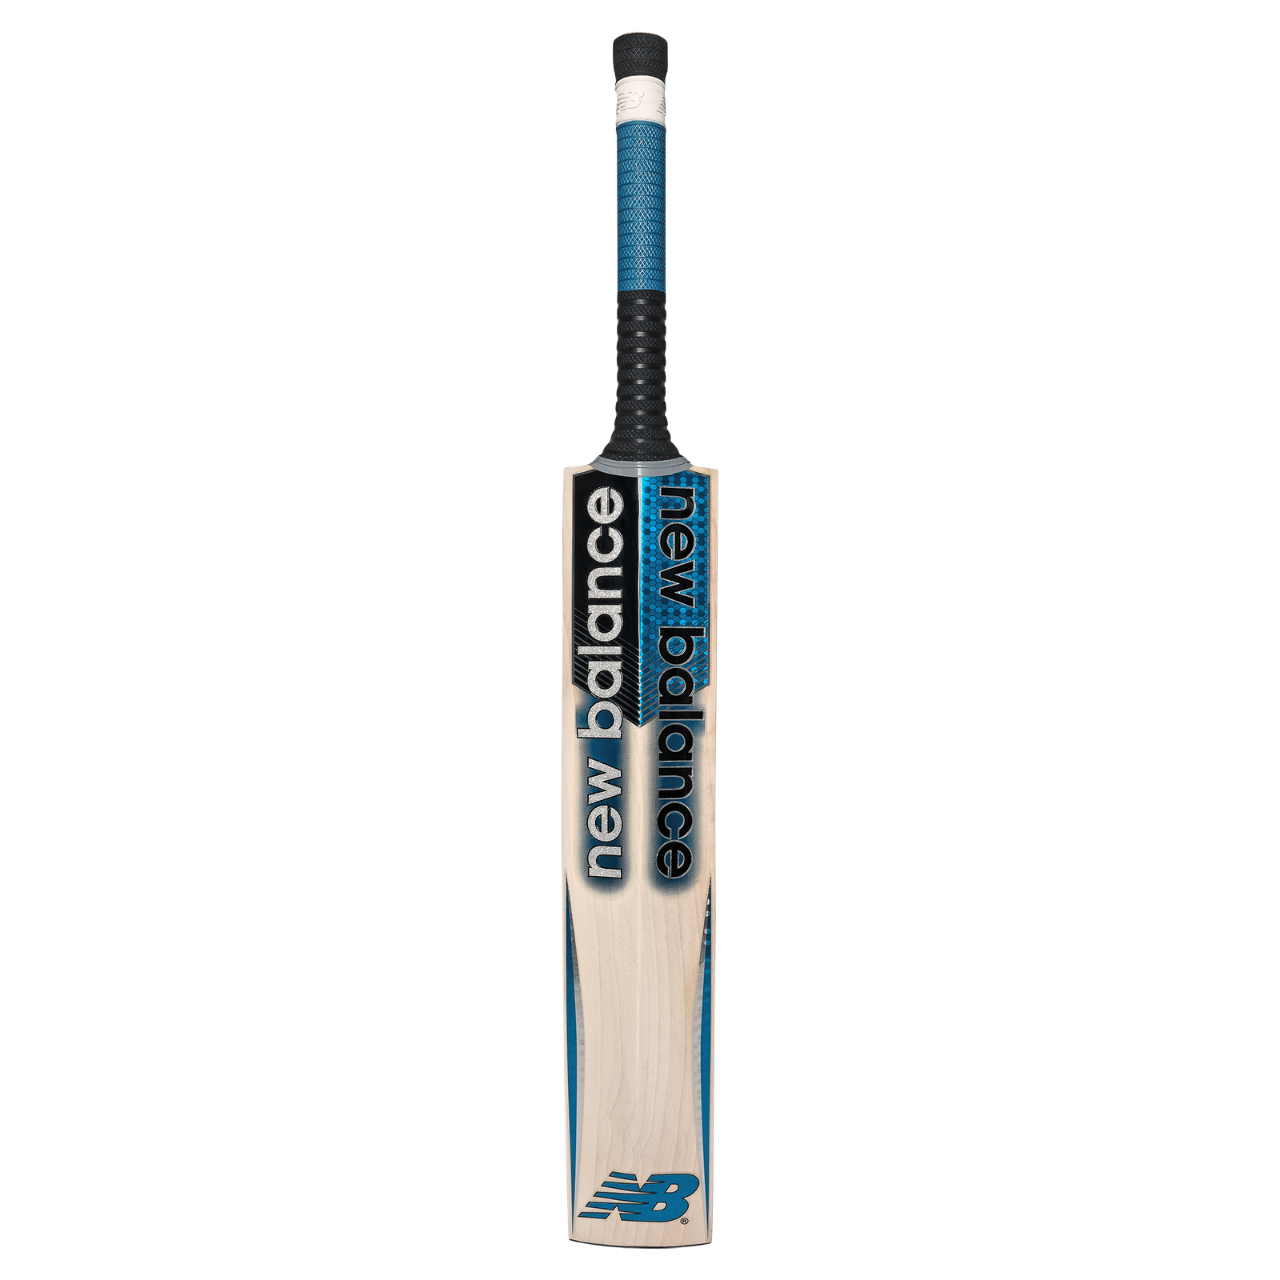 2021 New Balance DC 680 Junior Cricket Bat